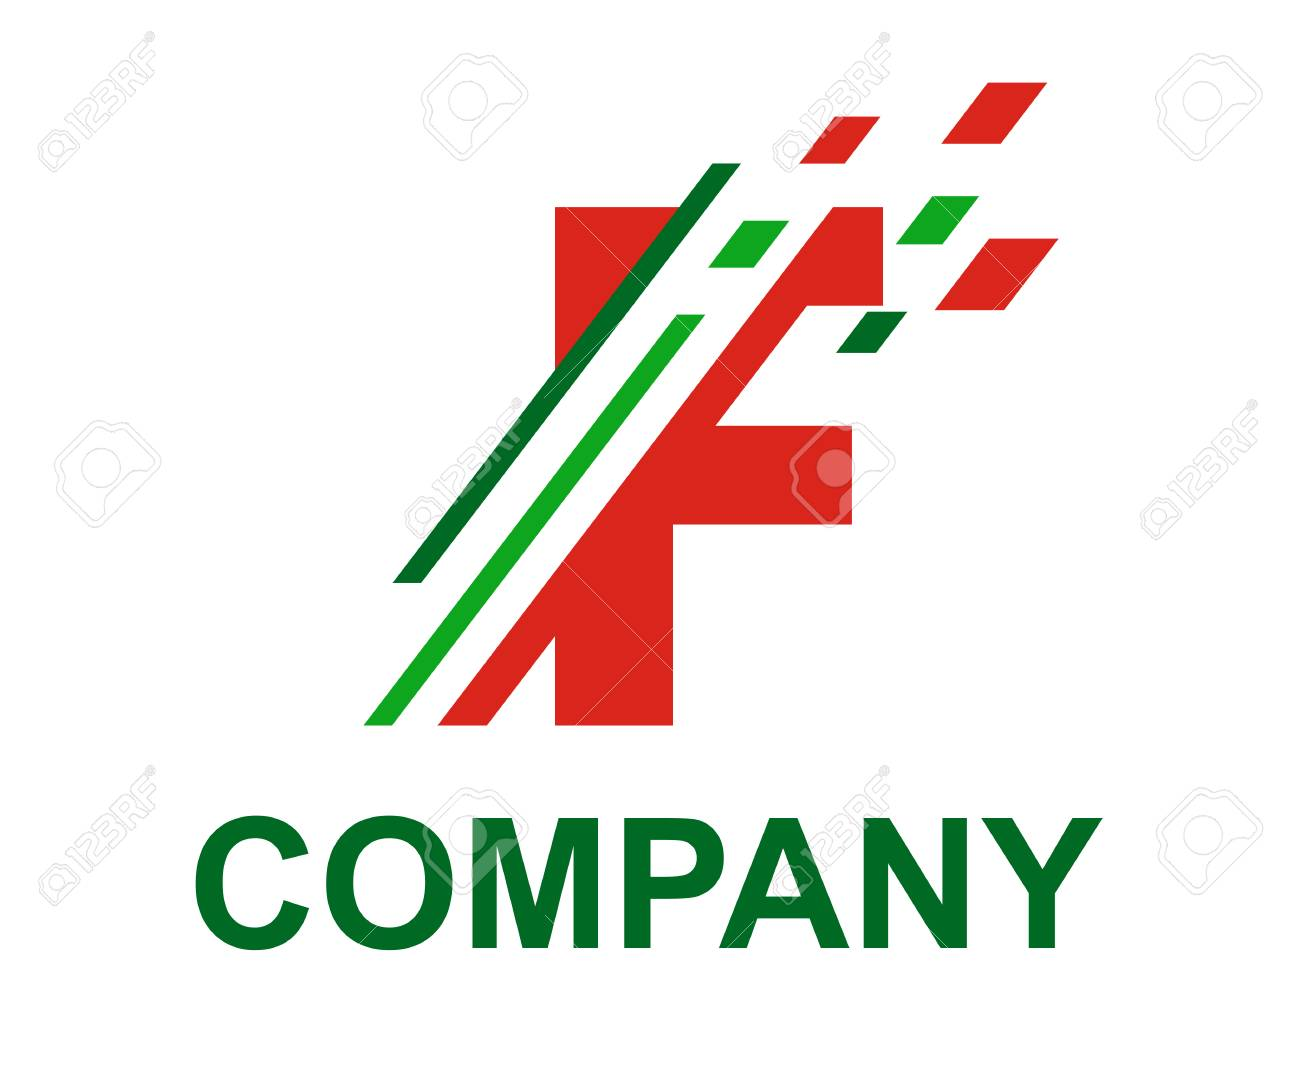 Green And Red Color Logo Symbol Digital Slice Type Letter F Like